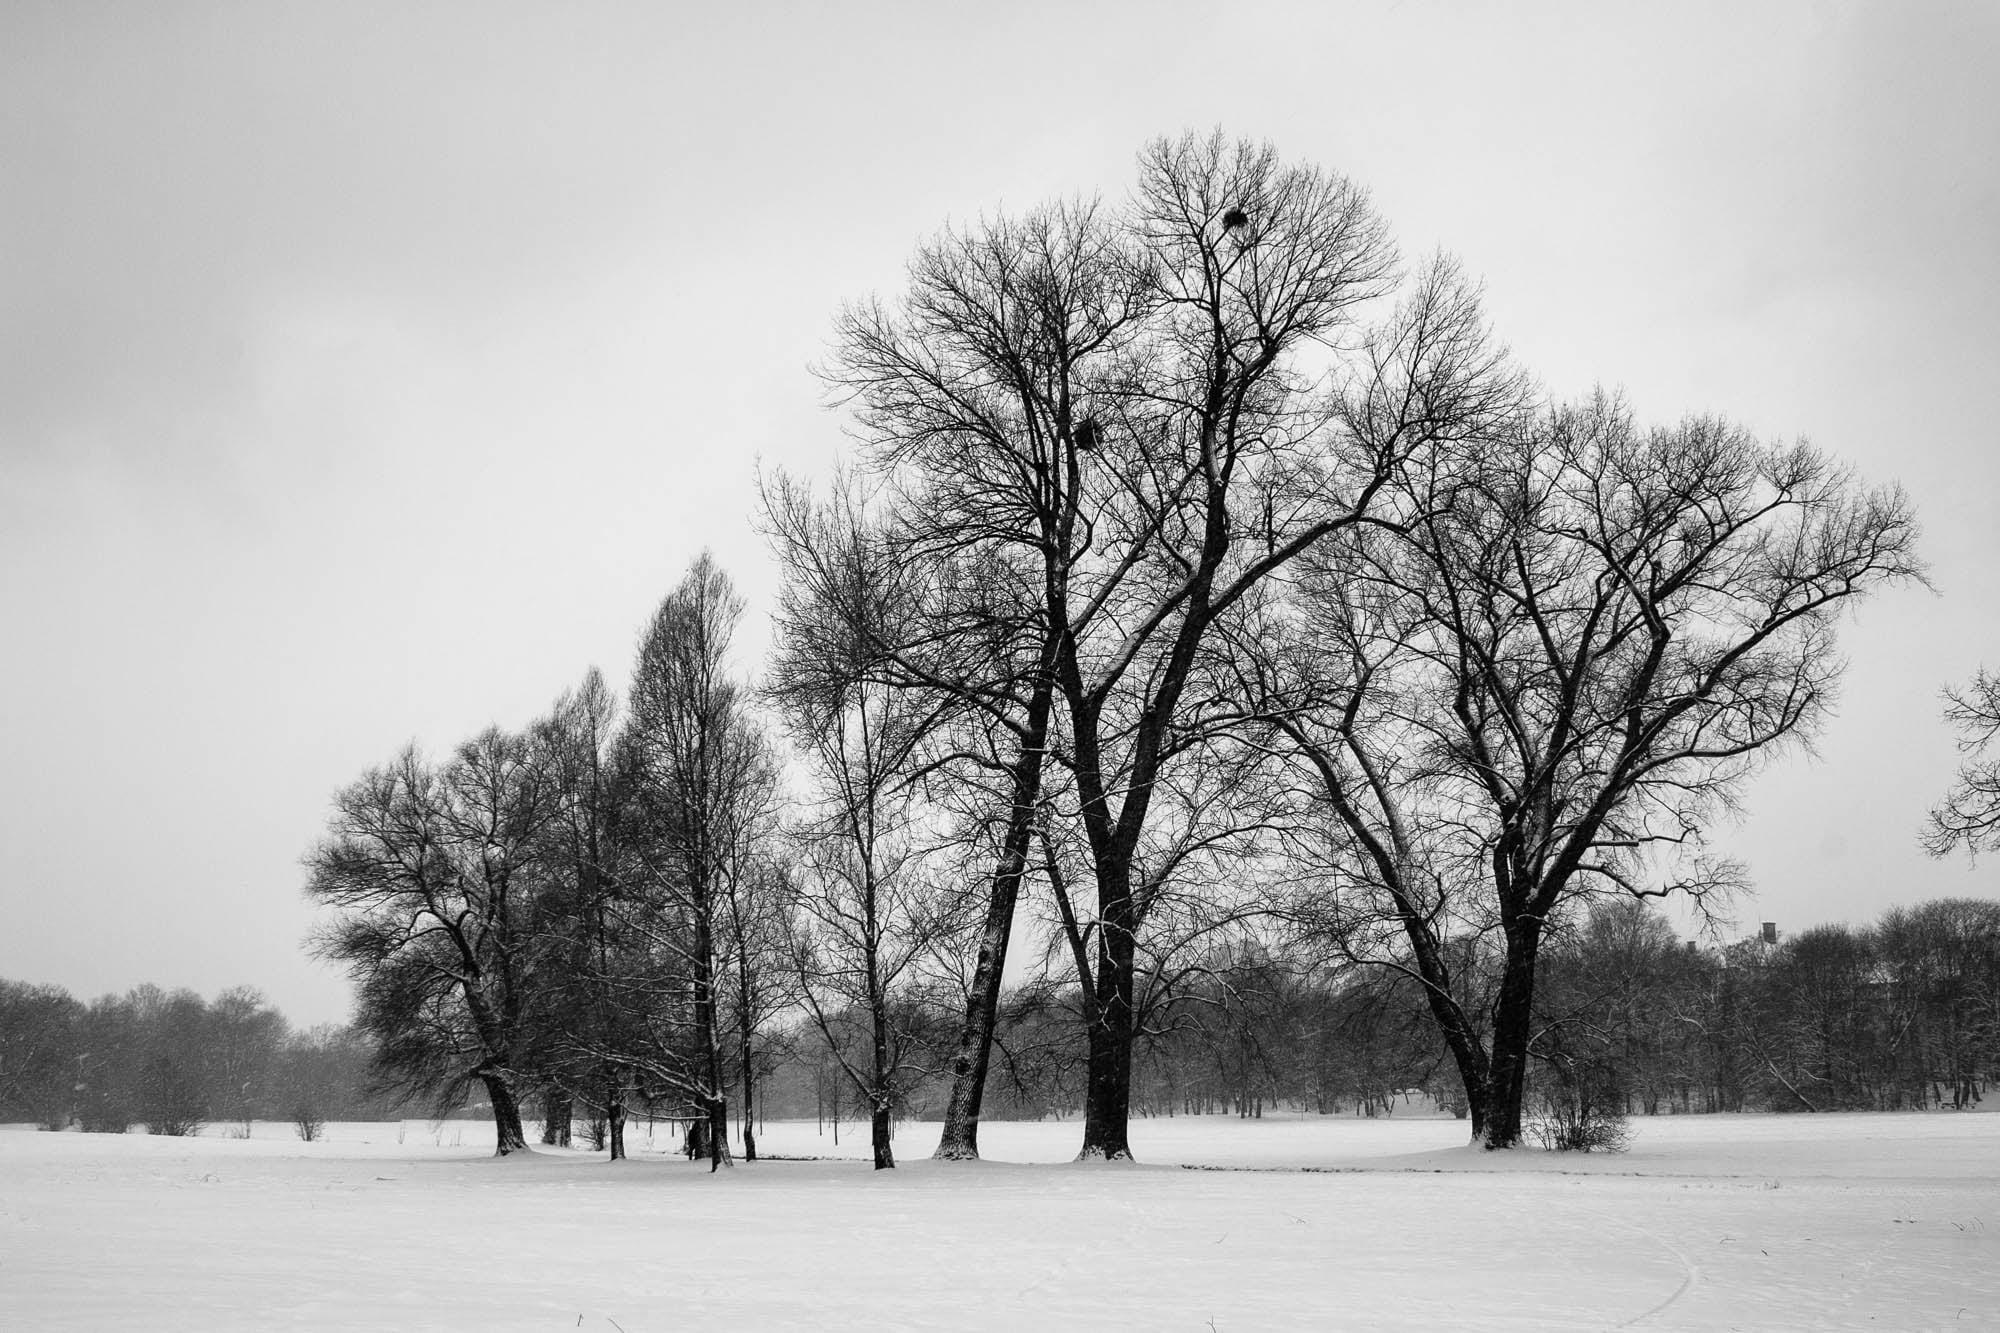 winter in Munich in 2005